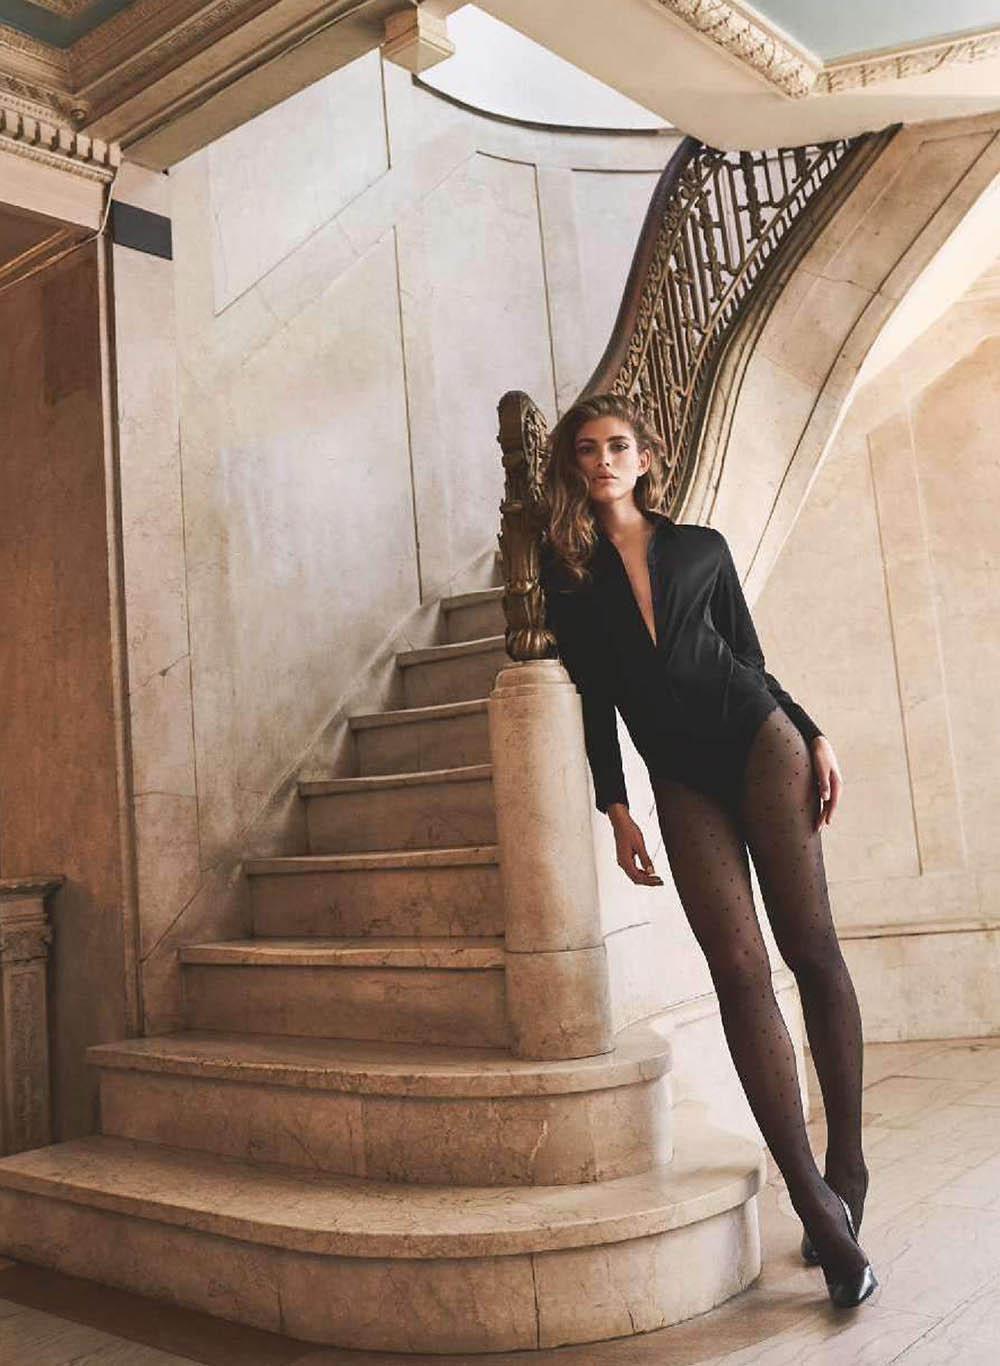 Valentina Sampaio covers Elle France October 11th, 2019 by Sebastian Kim